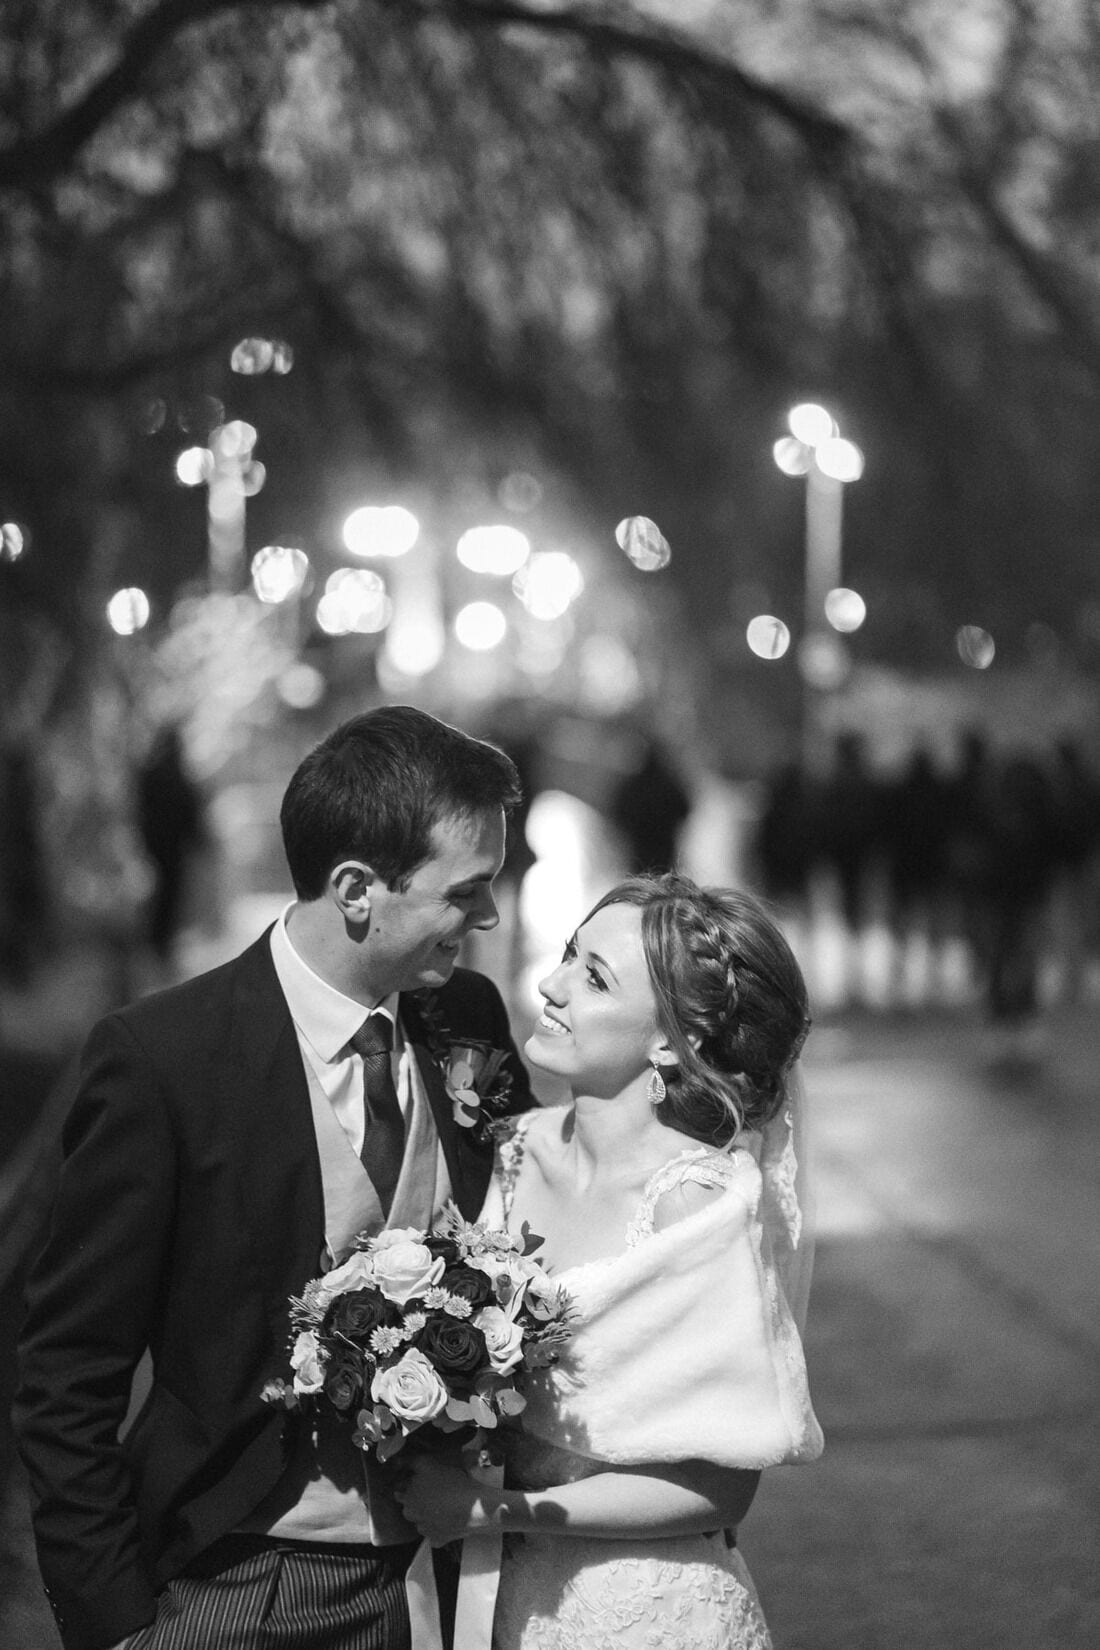 st james's park wedding photos London